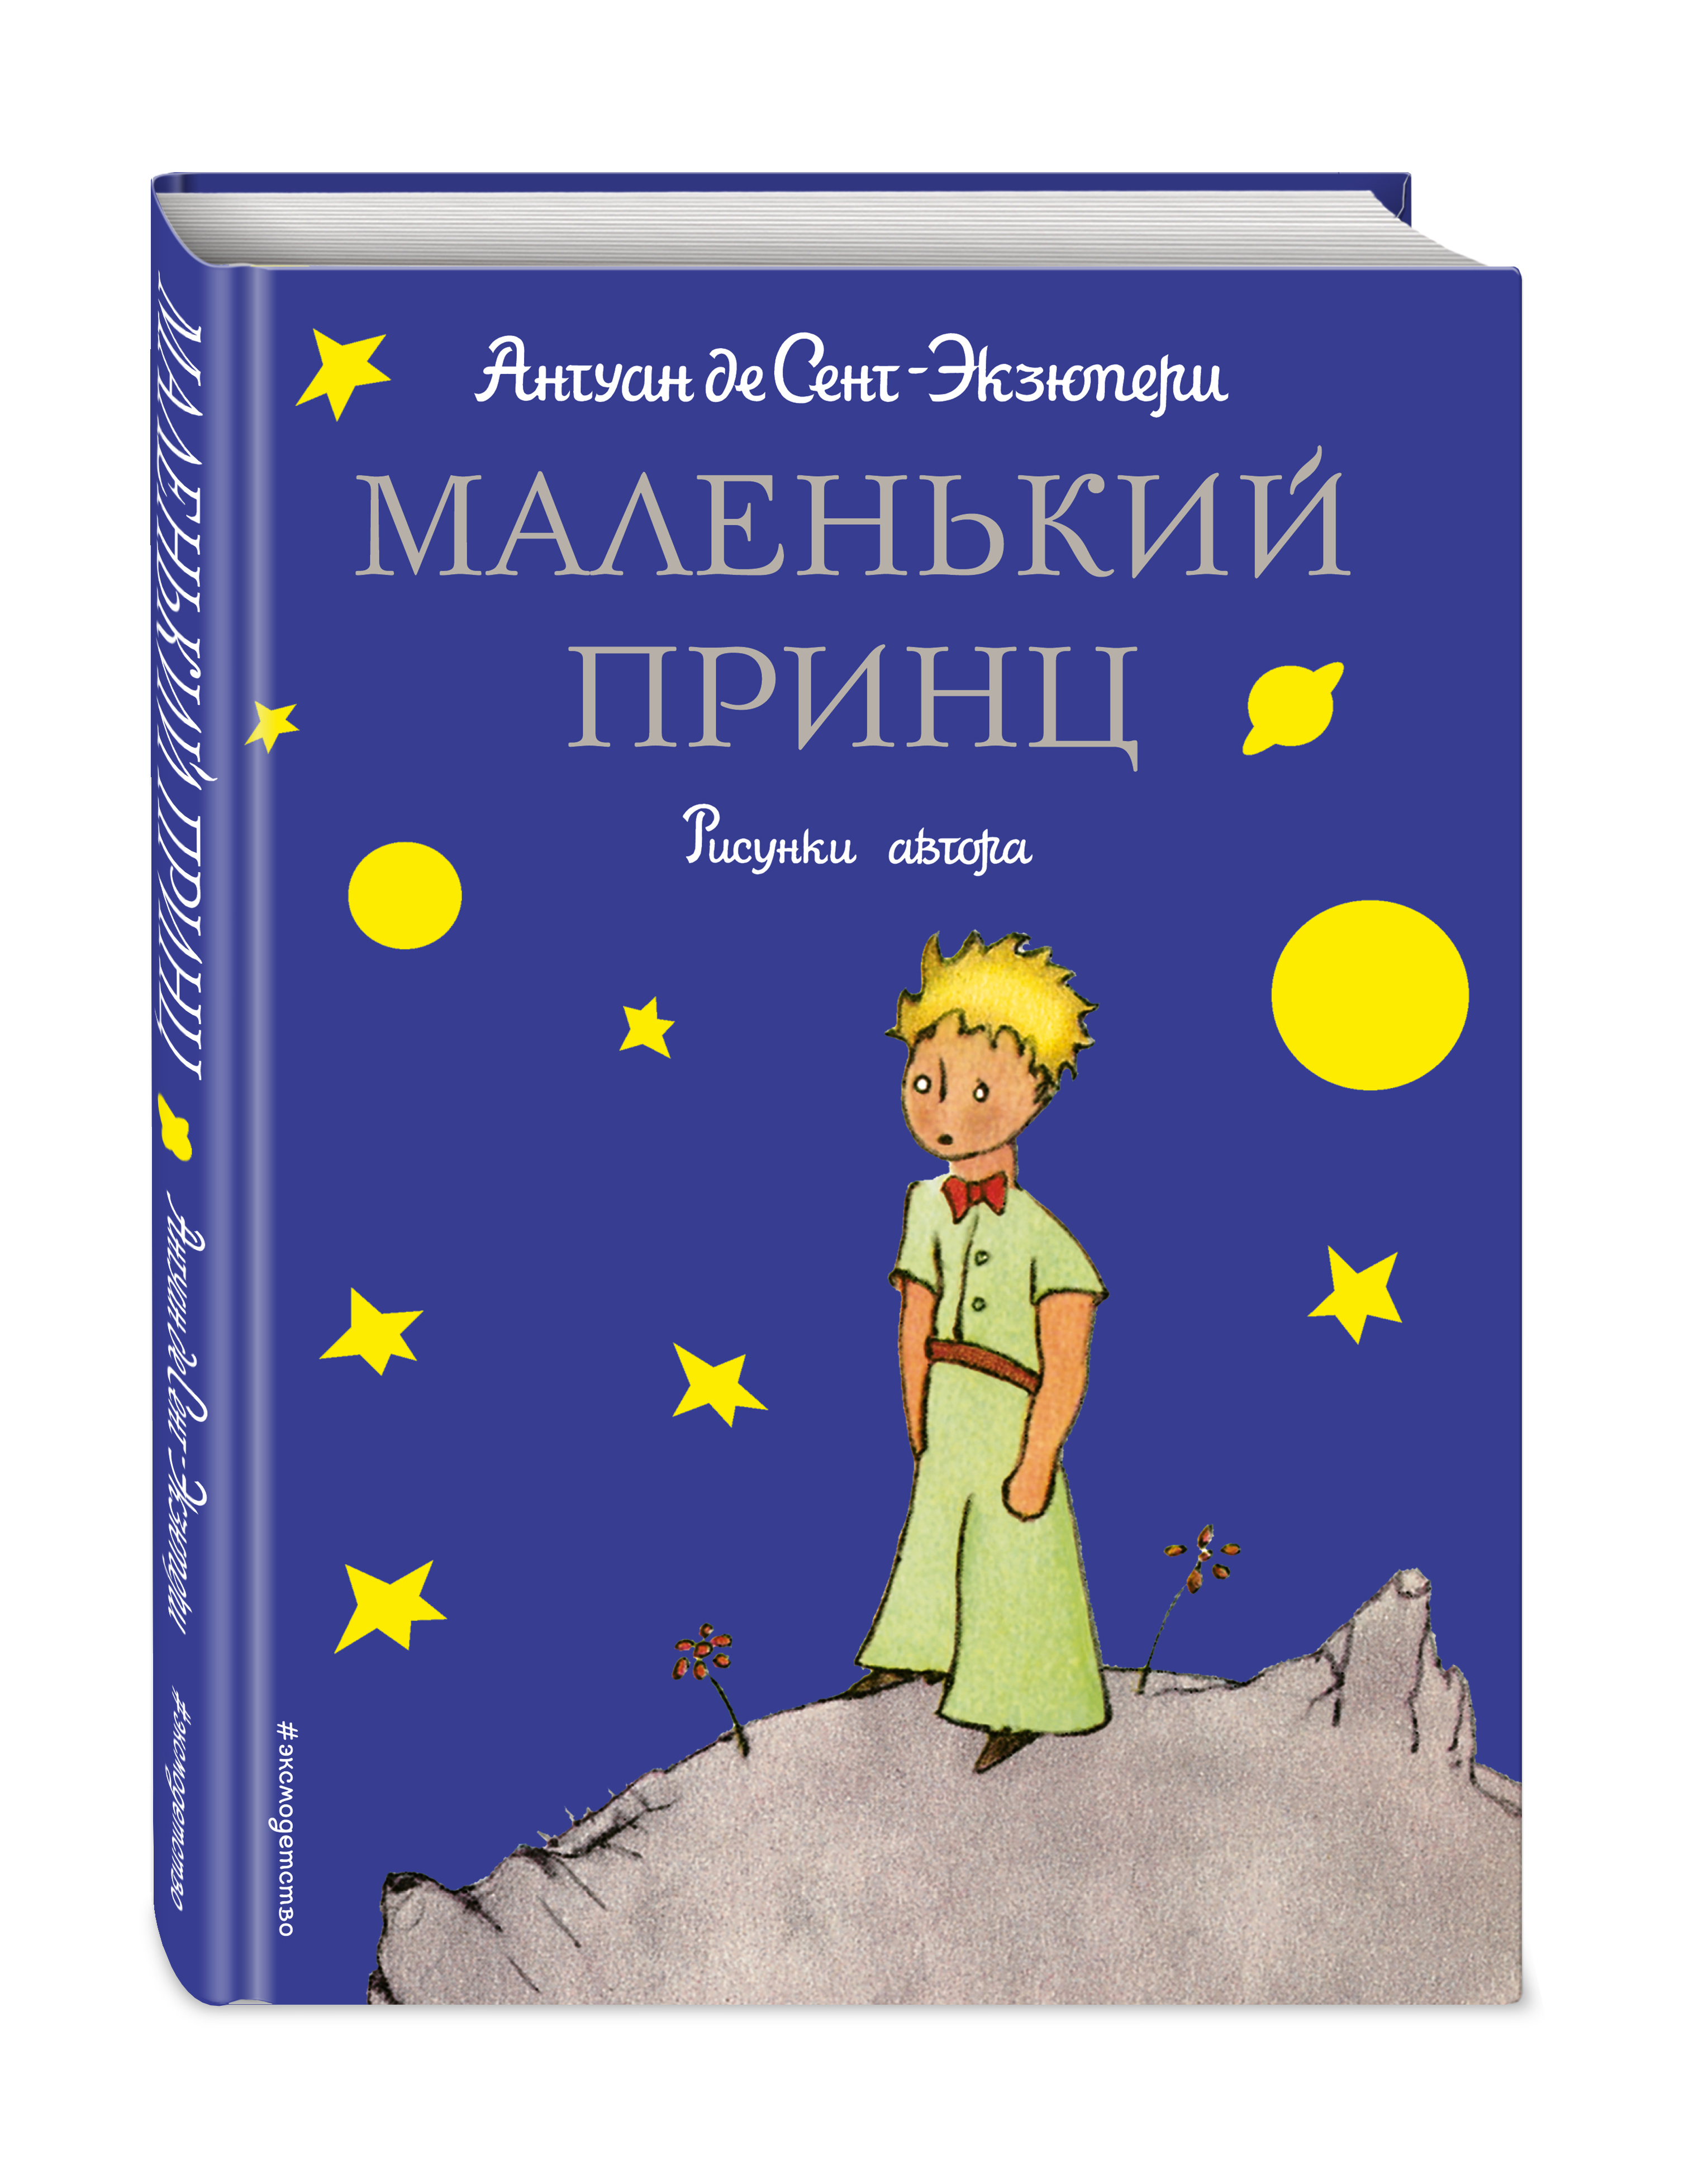 Сент-Экзюпери А. Маленький принц (рис. автора) harrison henry beanies navy